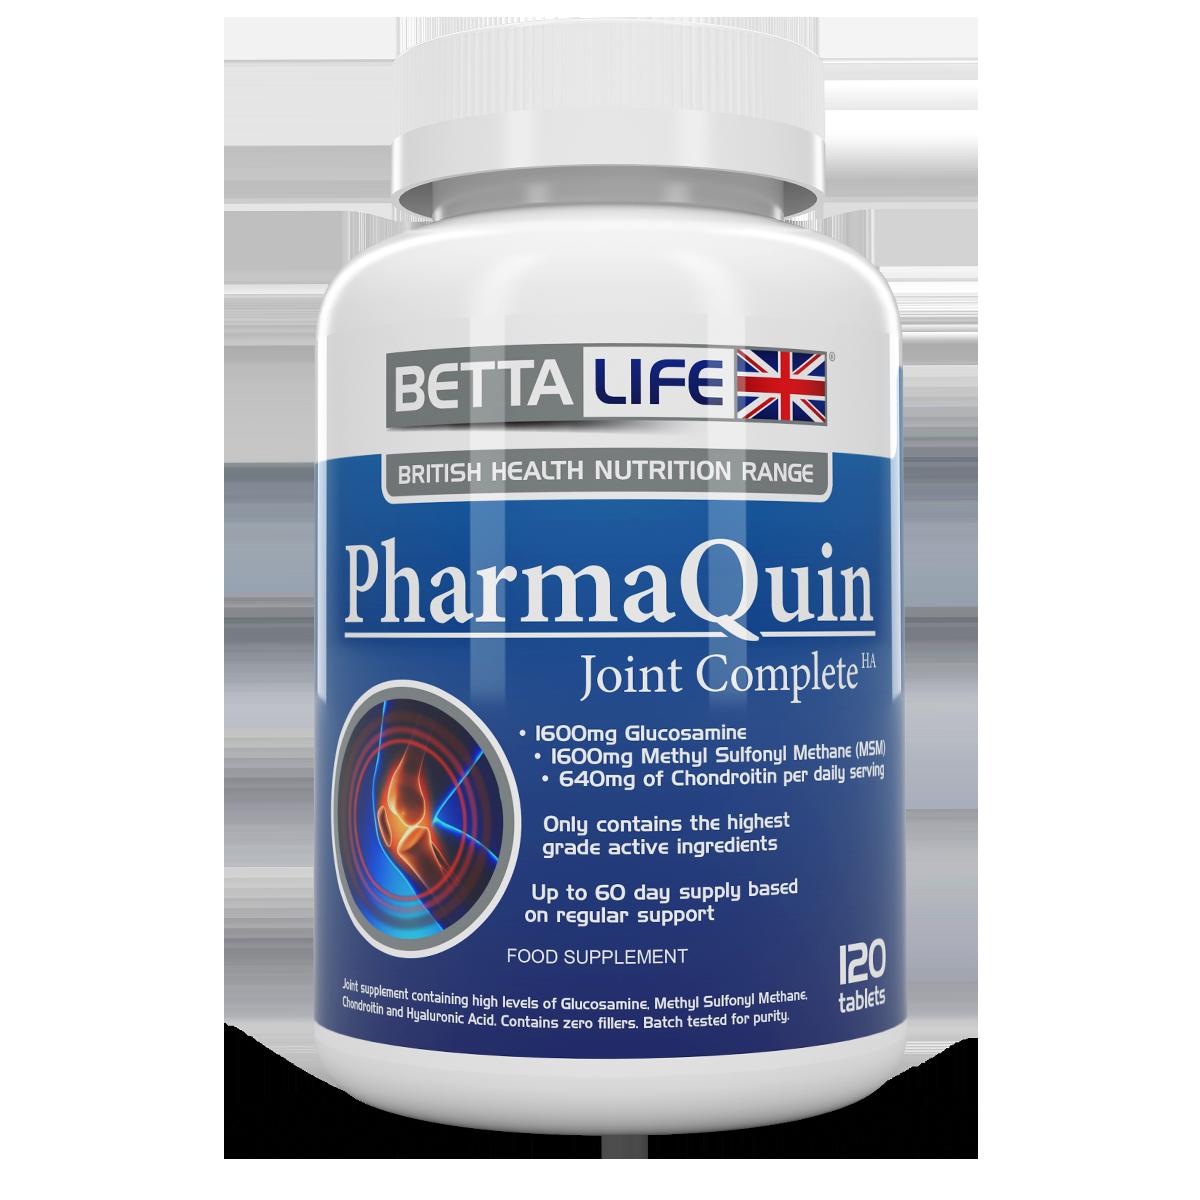 PharmaQuinHuman 120t front